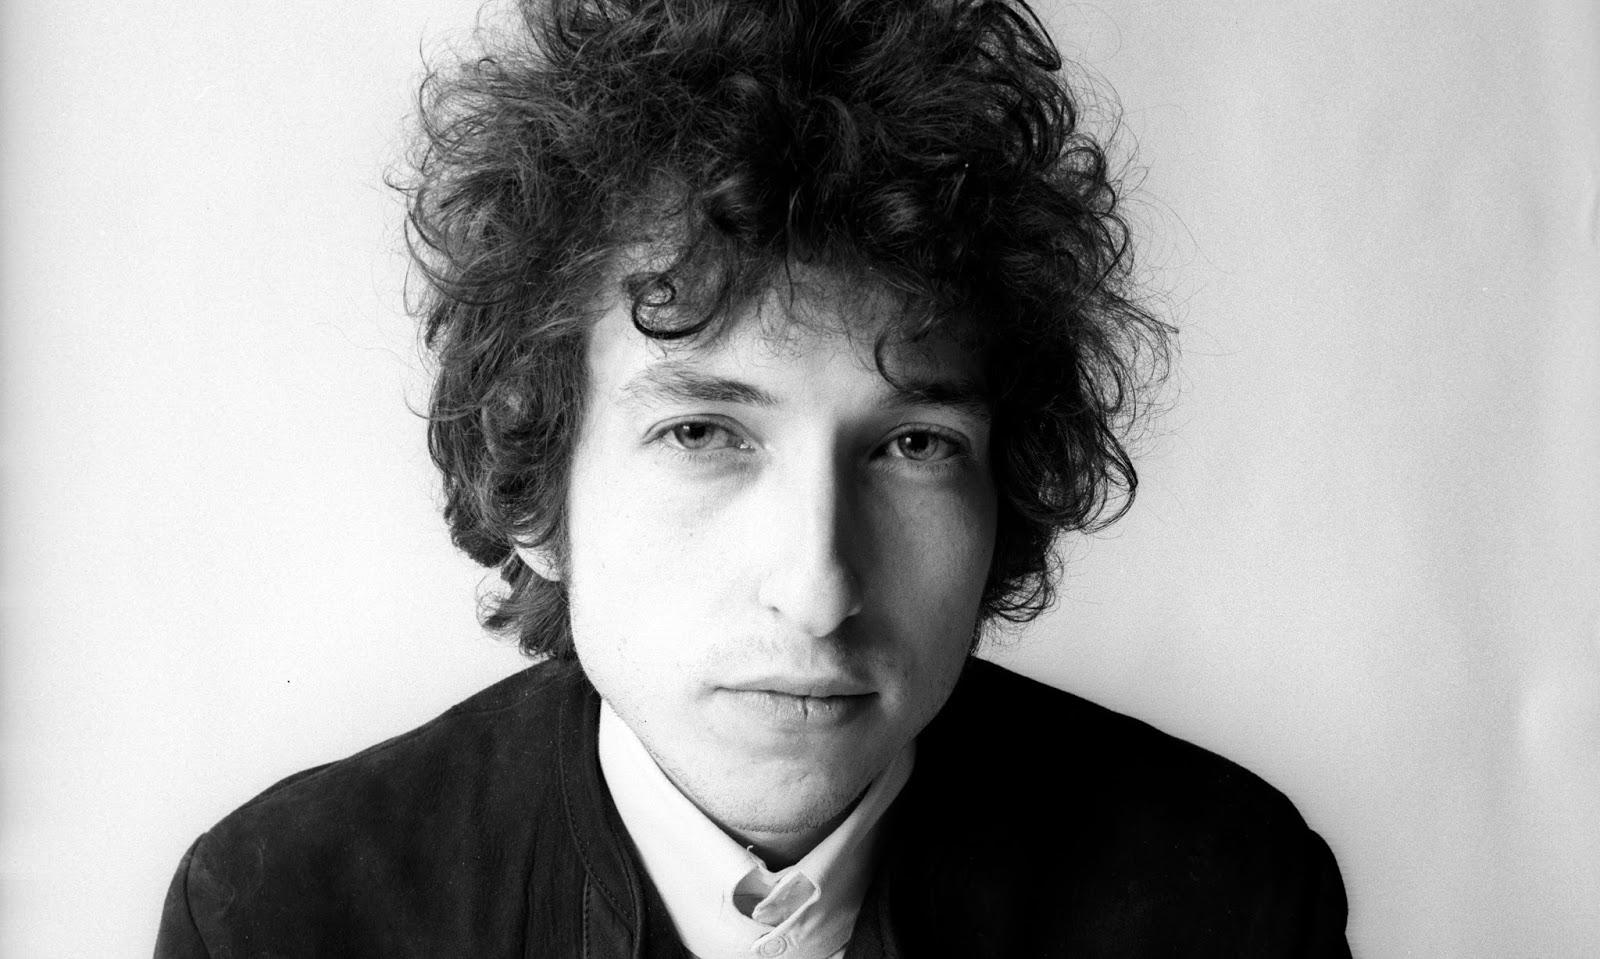 Bob Dylan, Literature Nobel Prize